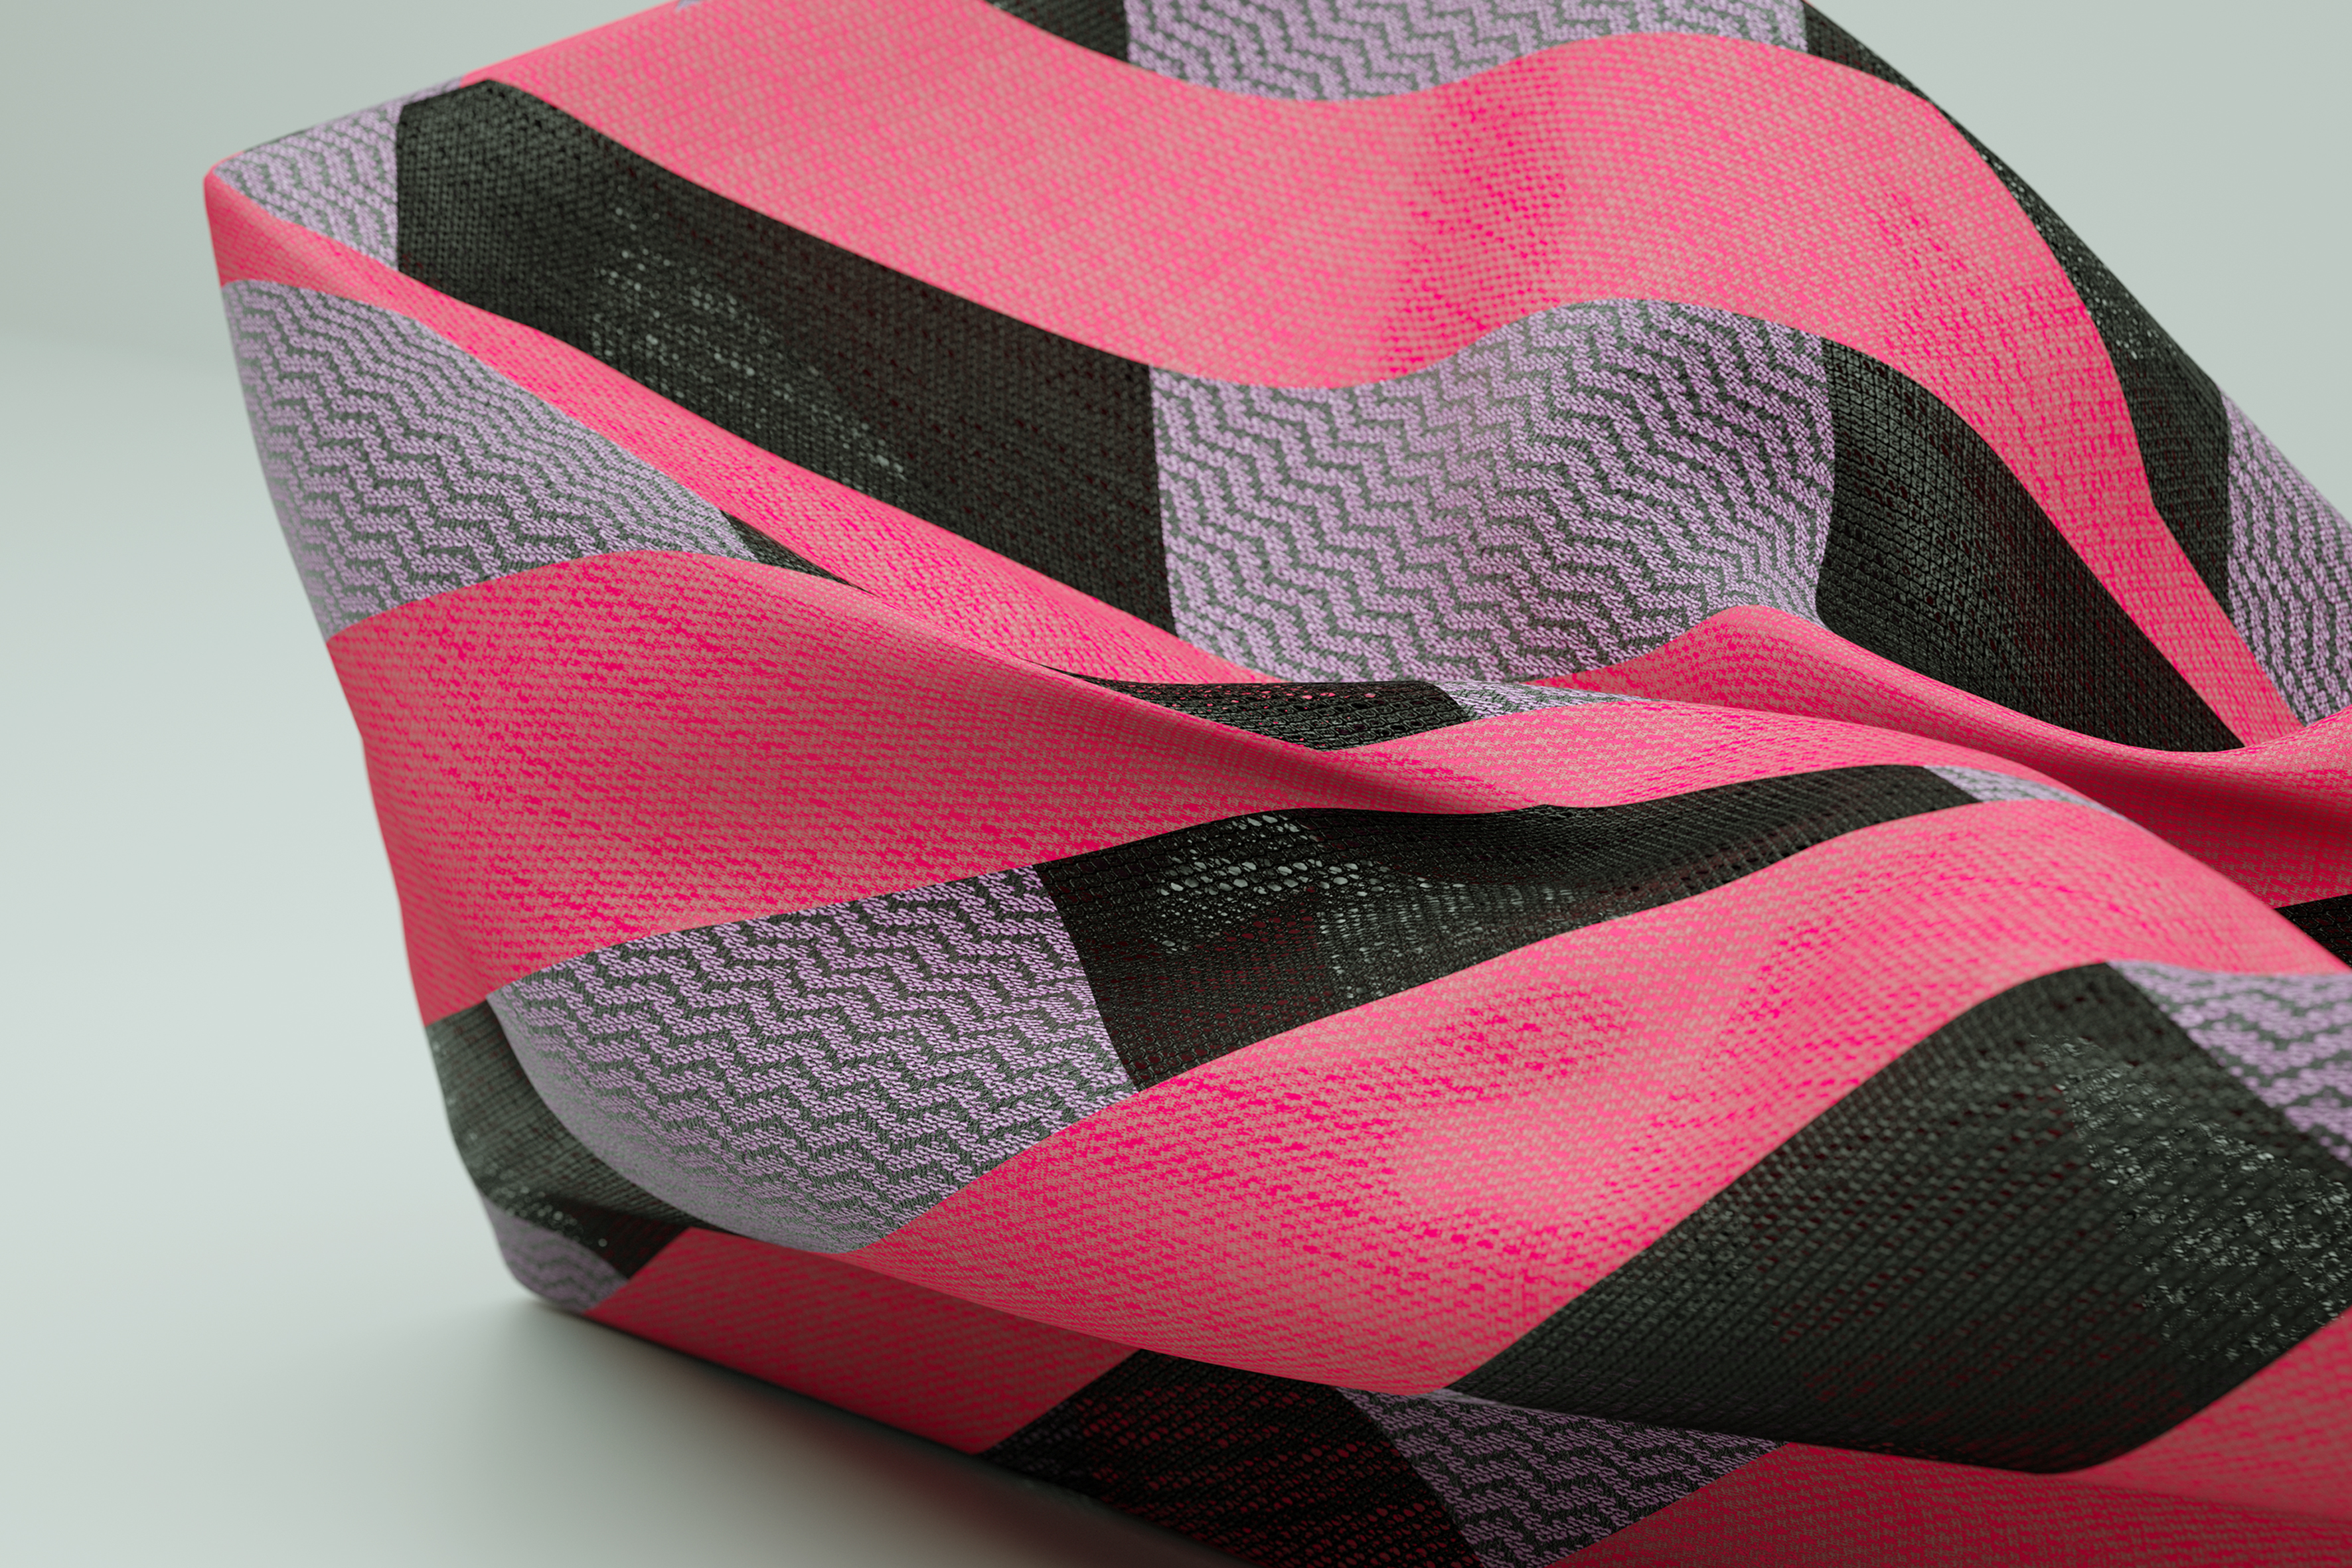 Andreas_Barden_Set_Textilesculpture_Image05